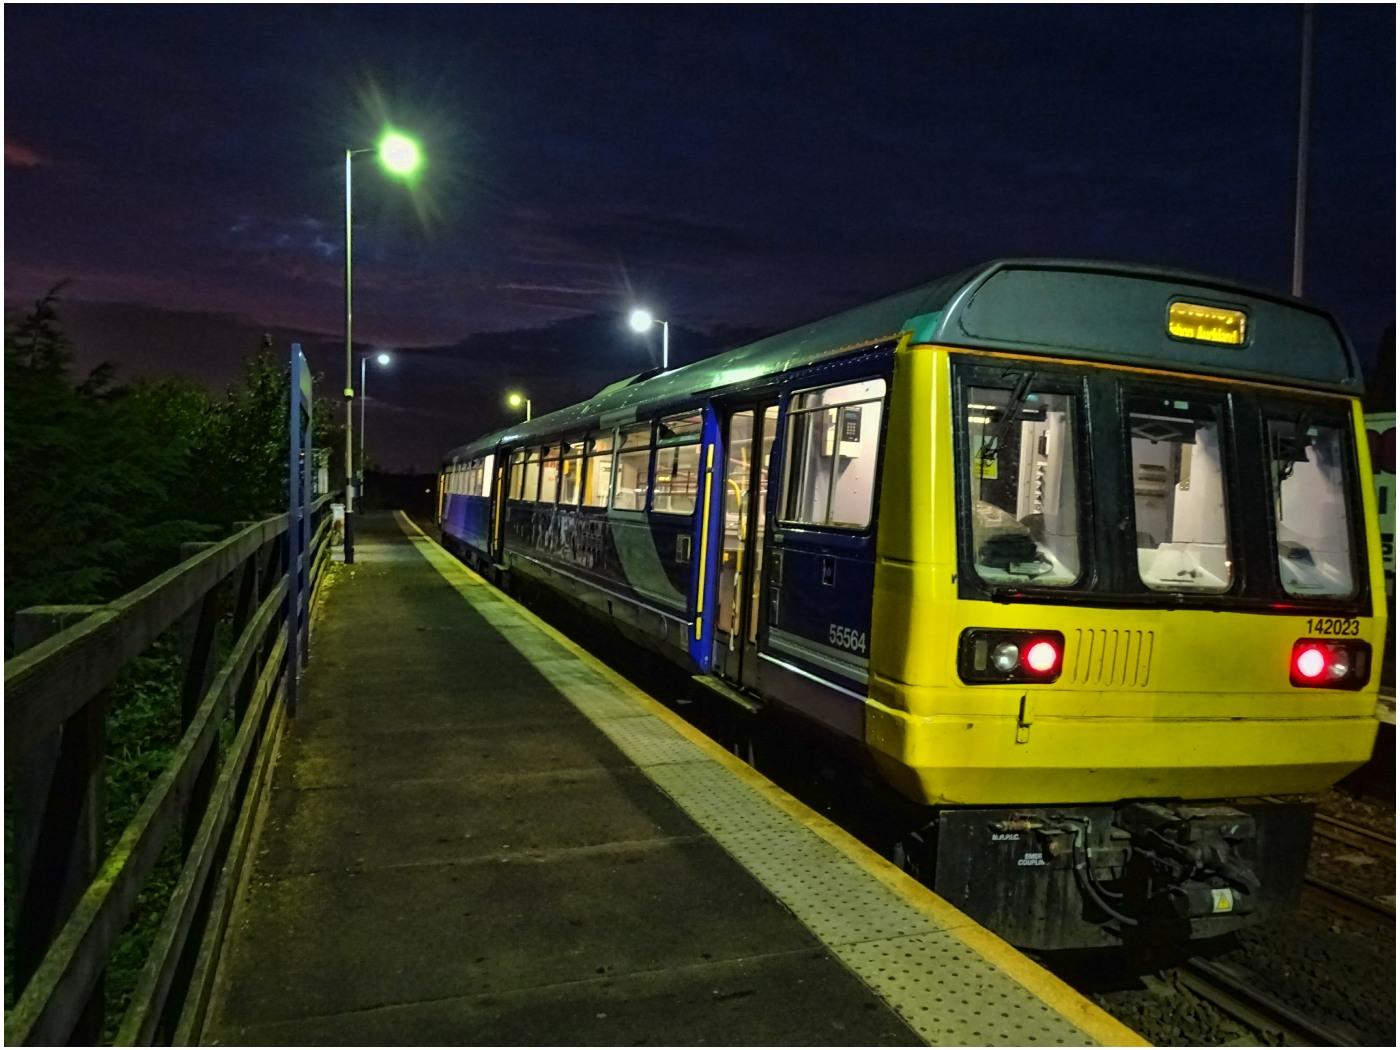 The Train at Platform 1